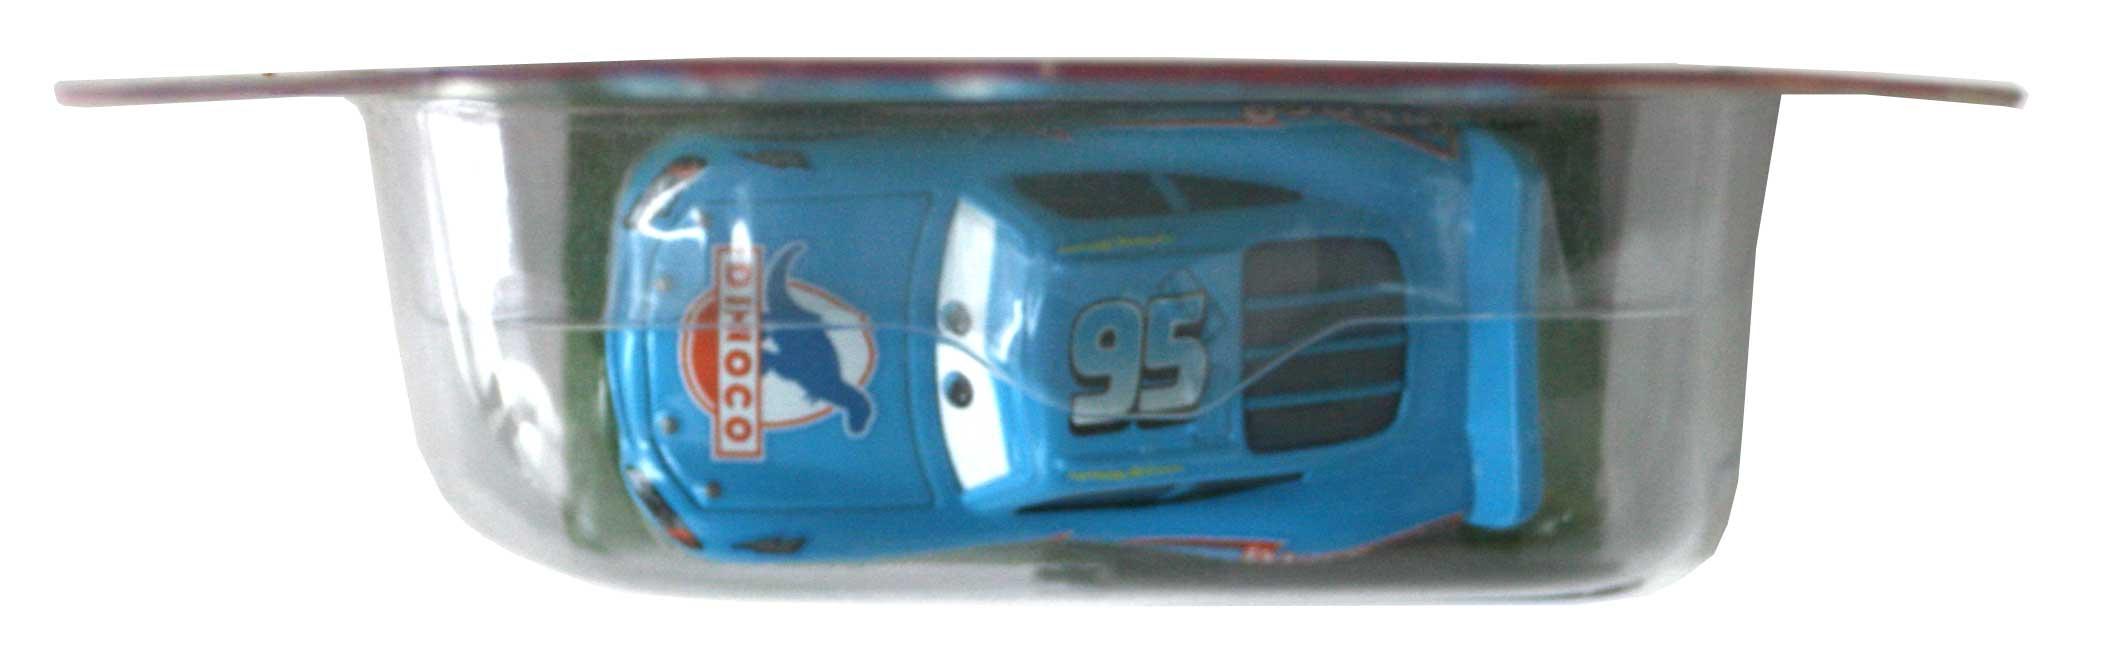 Mattel : Race O Rama - Flash McQueen Dinoco